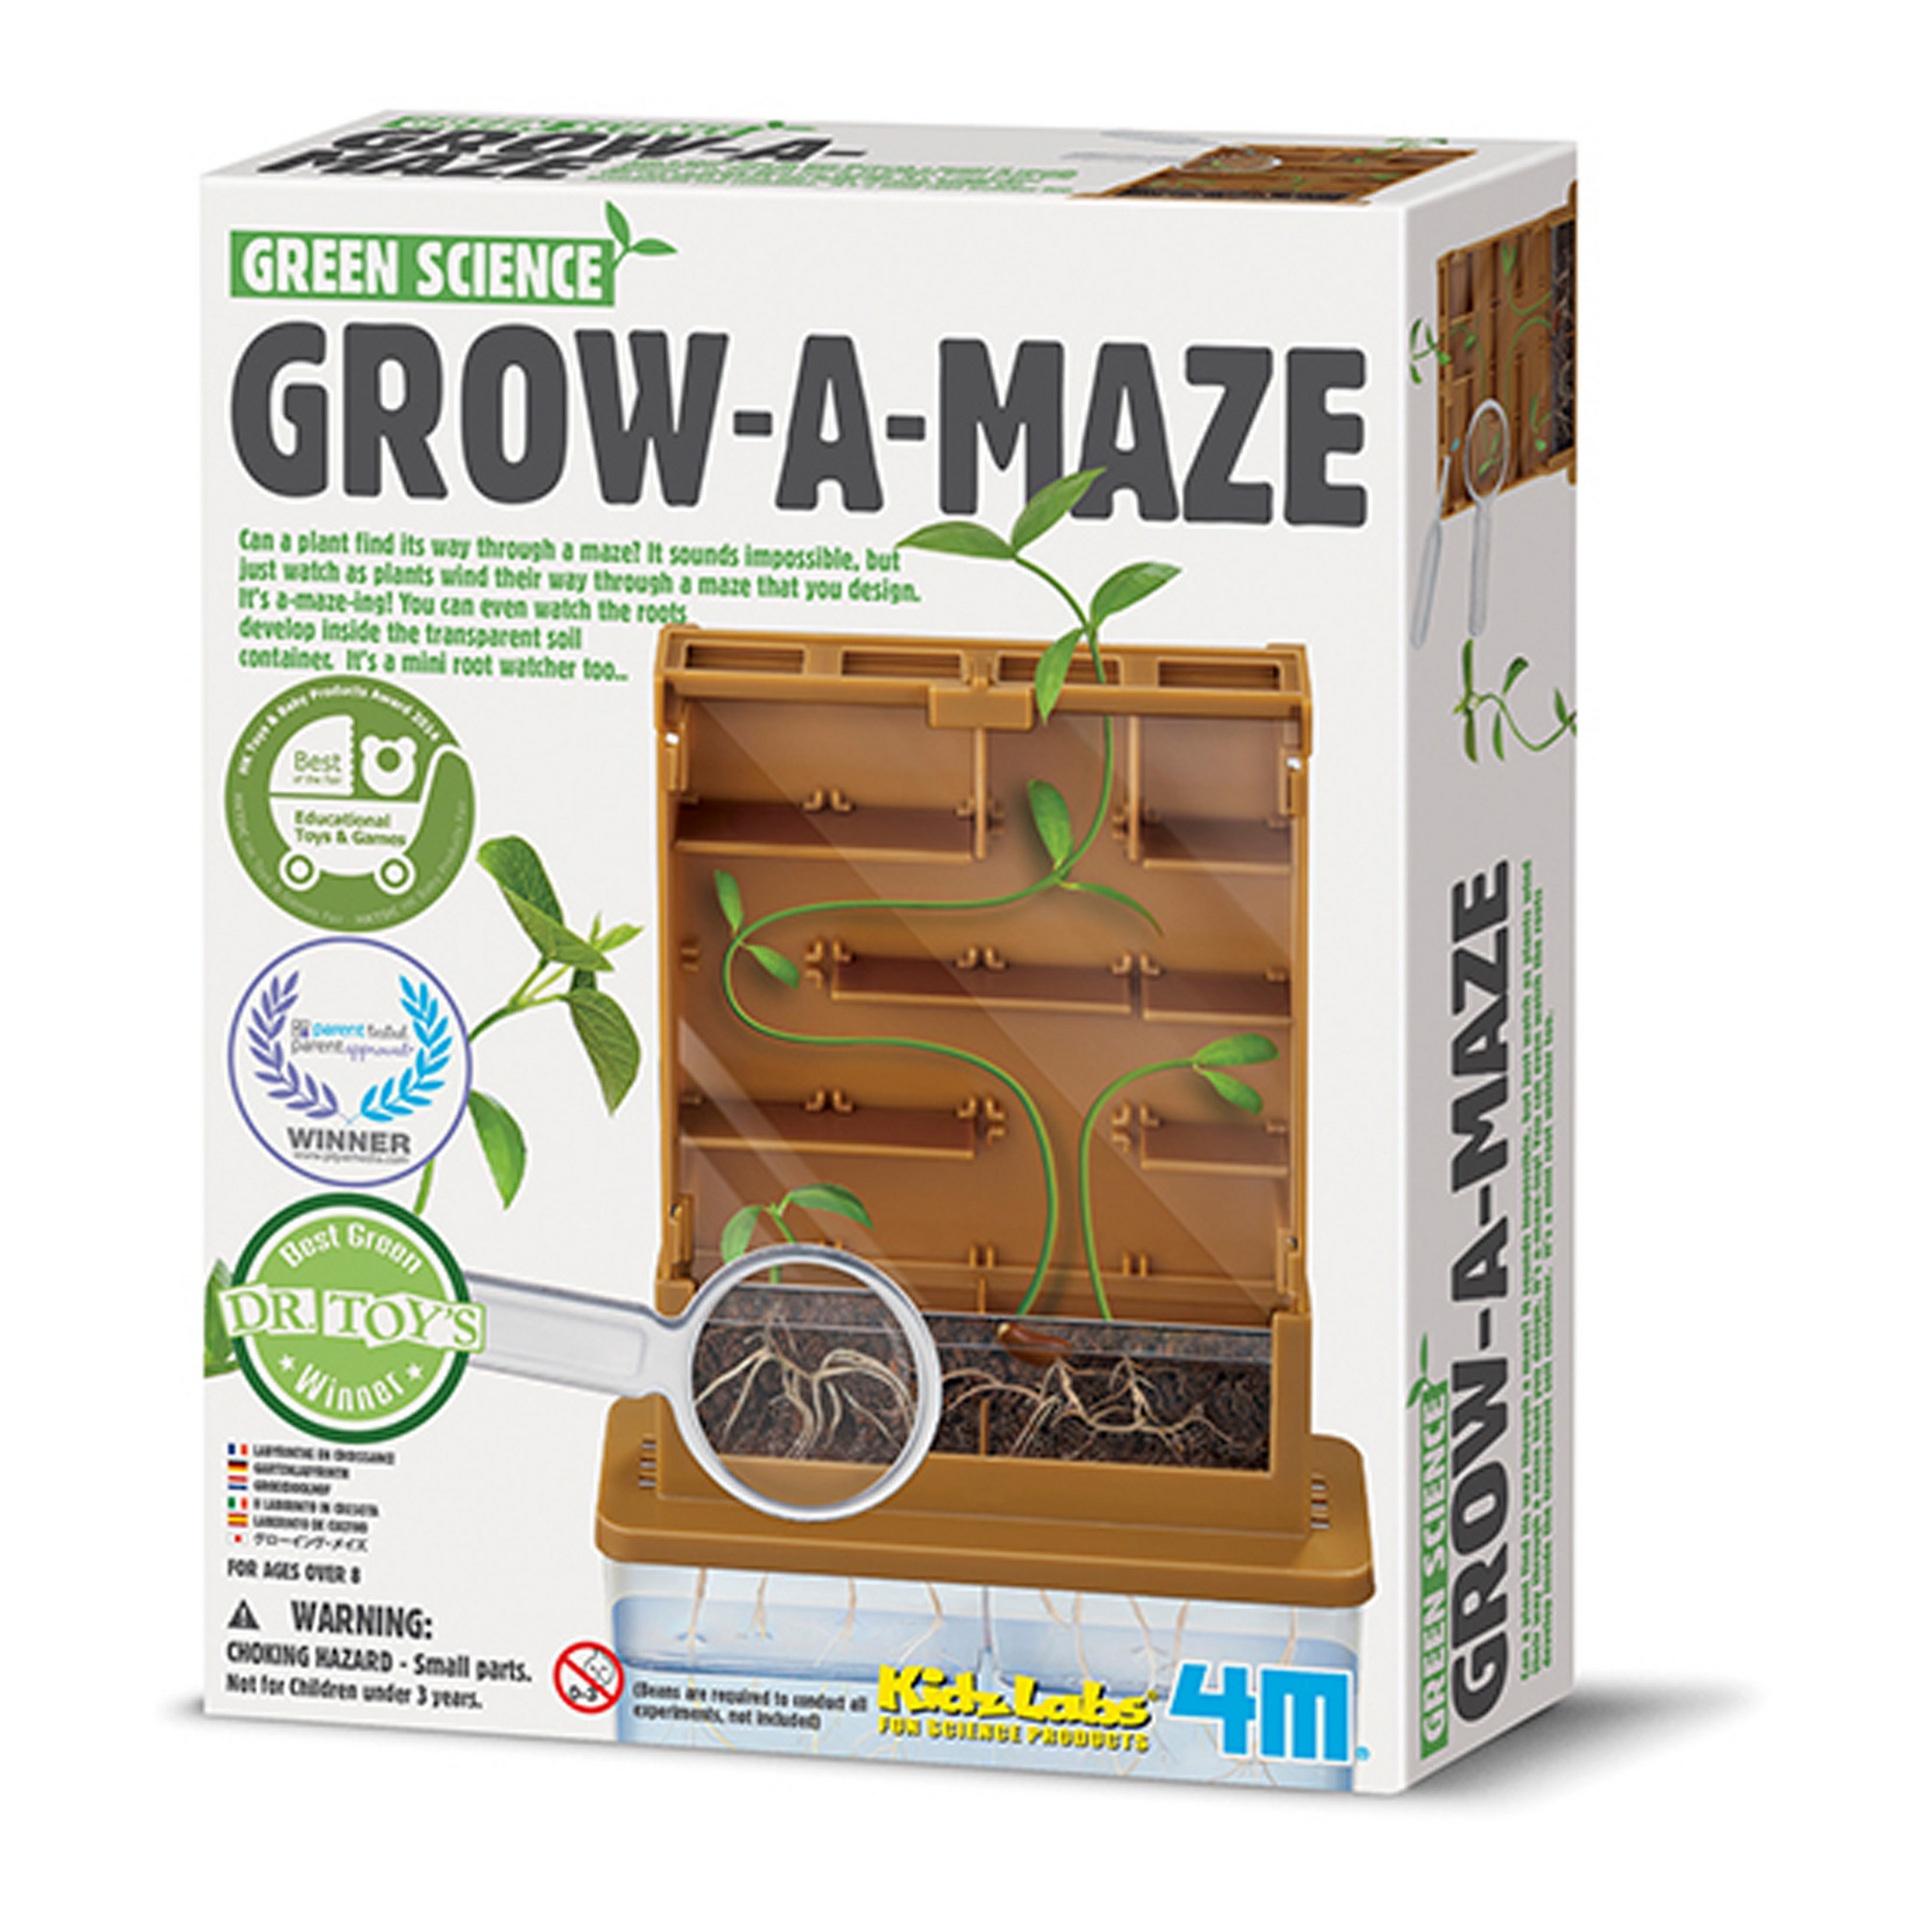 GREEN SCIENCE GROW A MAZE